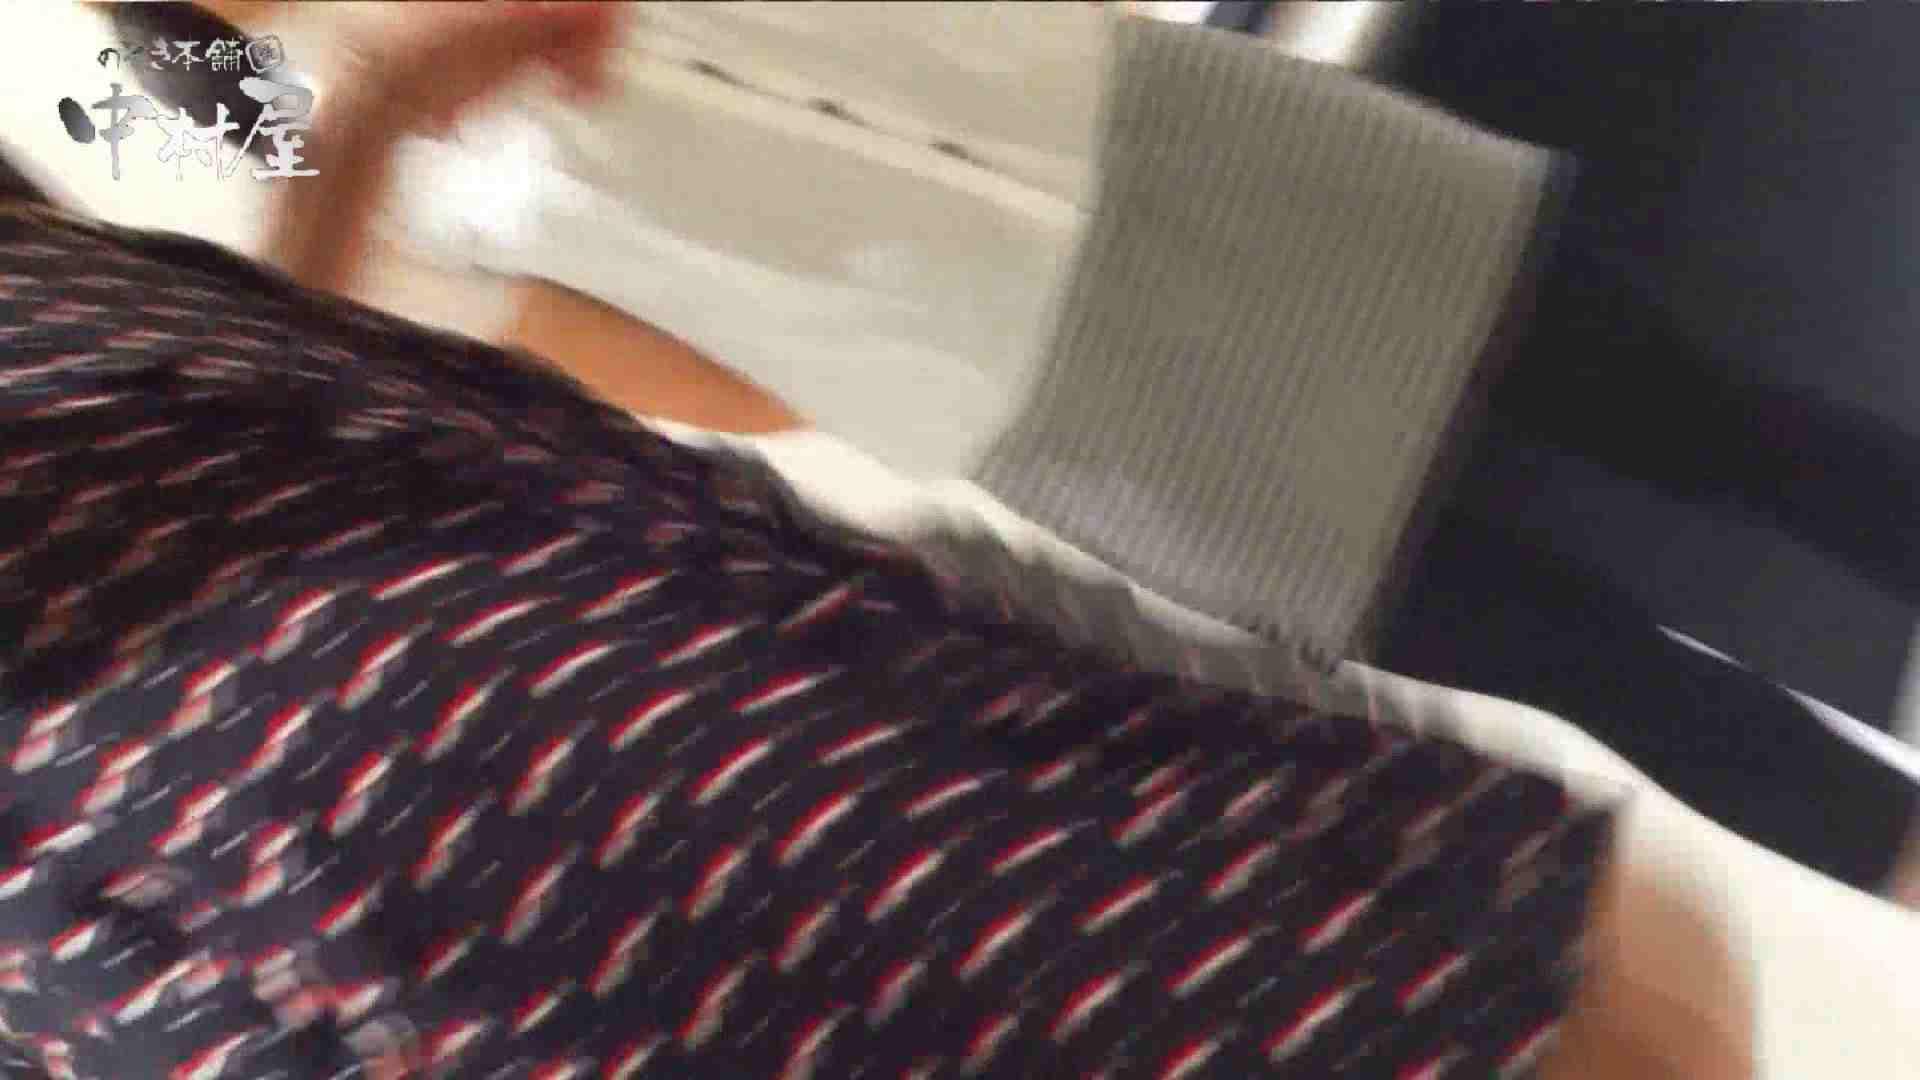 vol.43 可愛いカリスマ店員限定‼胸チラ&パンチラ 美脚おねーさんの胸元ゲット! エロティックなOL AV無料動画キャプチャ 86画像 20